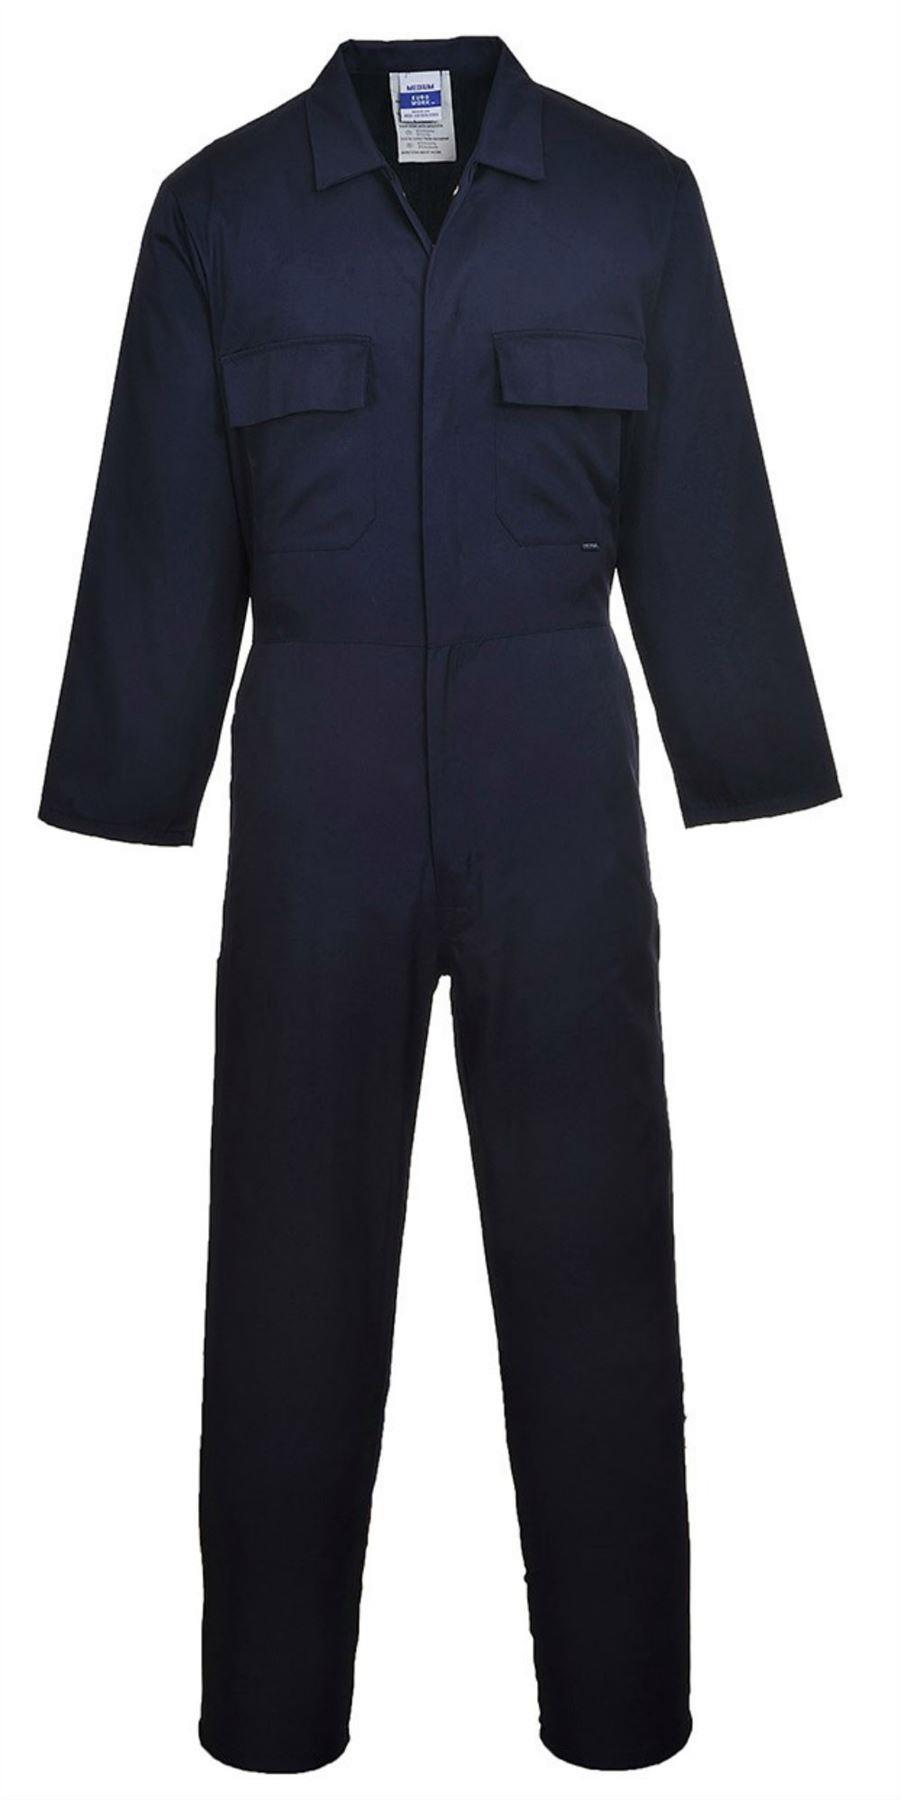 Portwest Standard Workwear Overalls - Navy 2XL